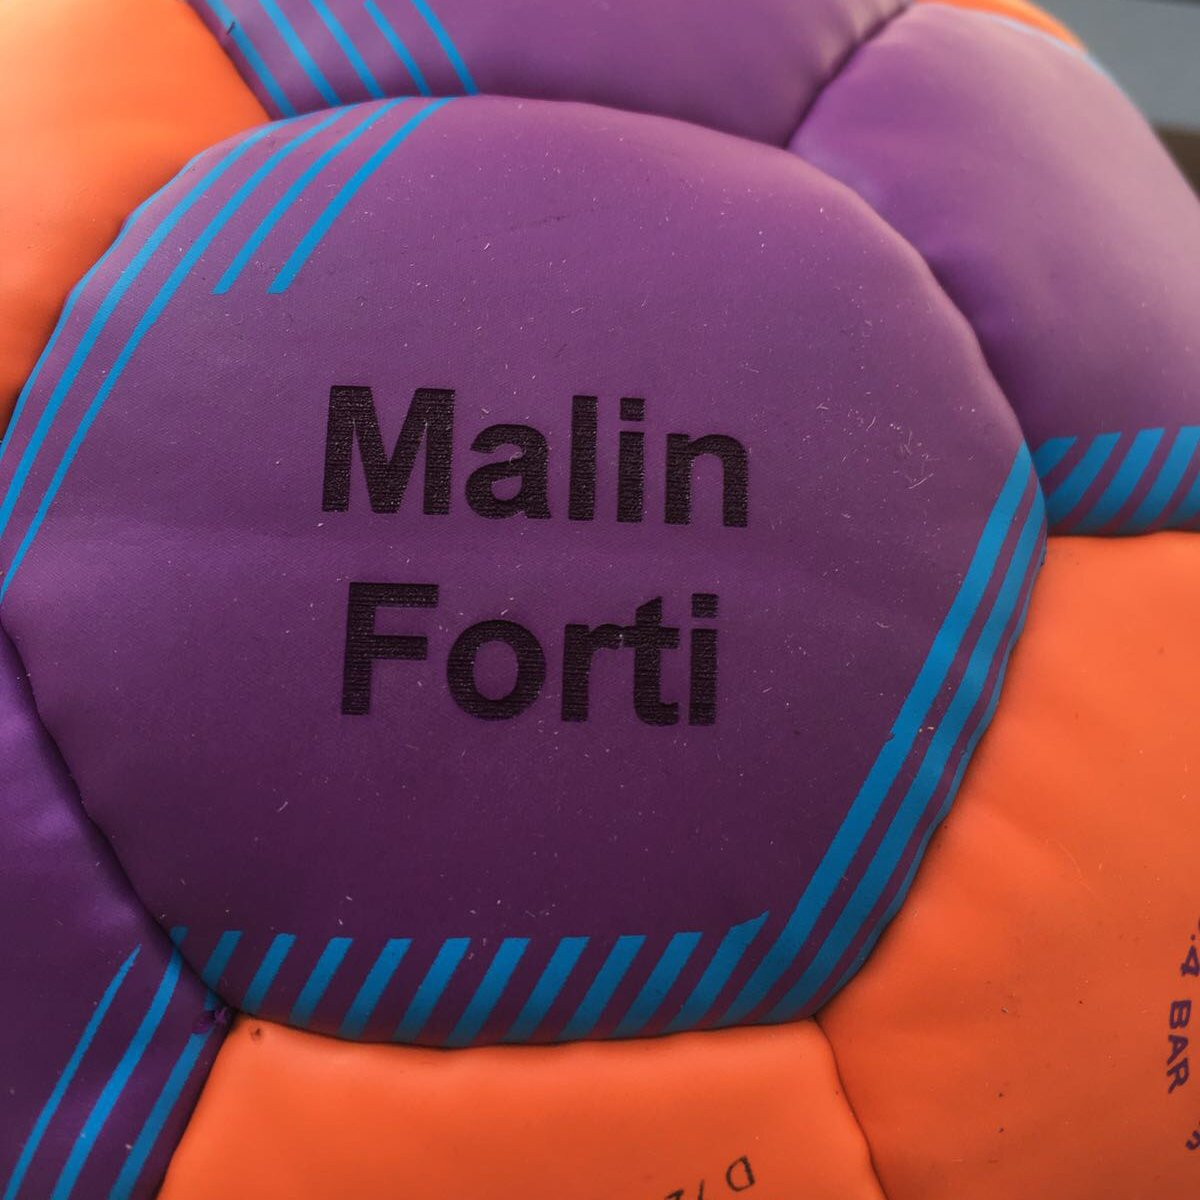 handball gravieren lassen handballgravur mit lasergravur. Black Bedroom Furniture Sets. Home Design Ideas